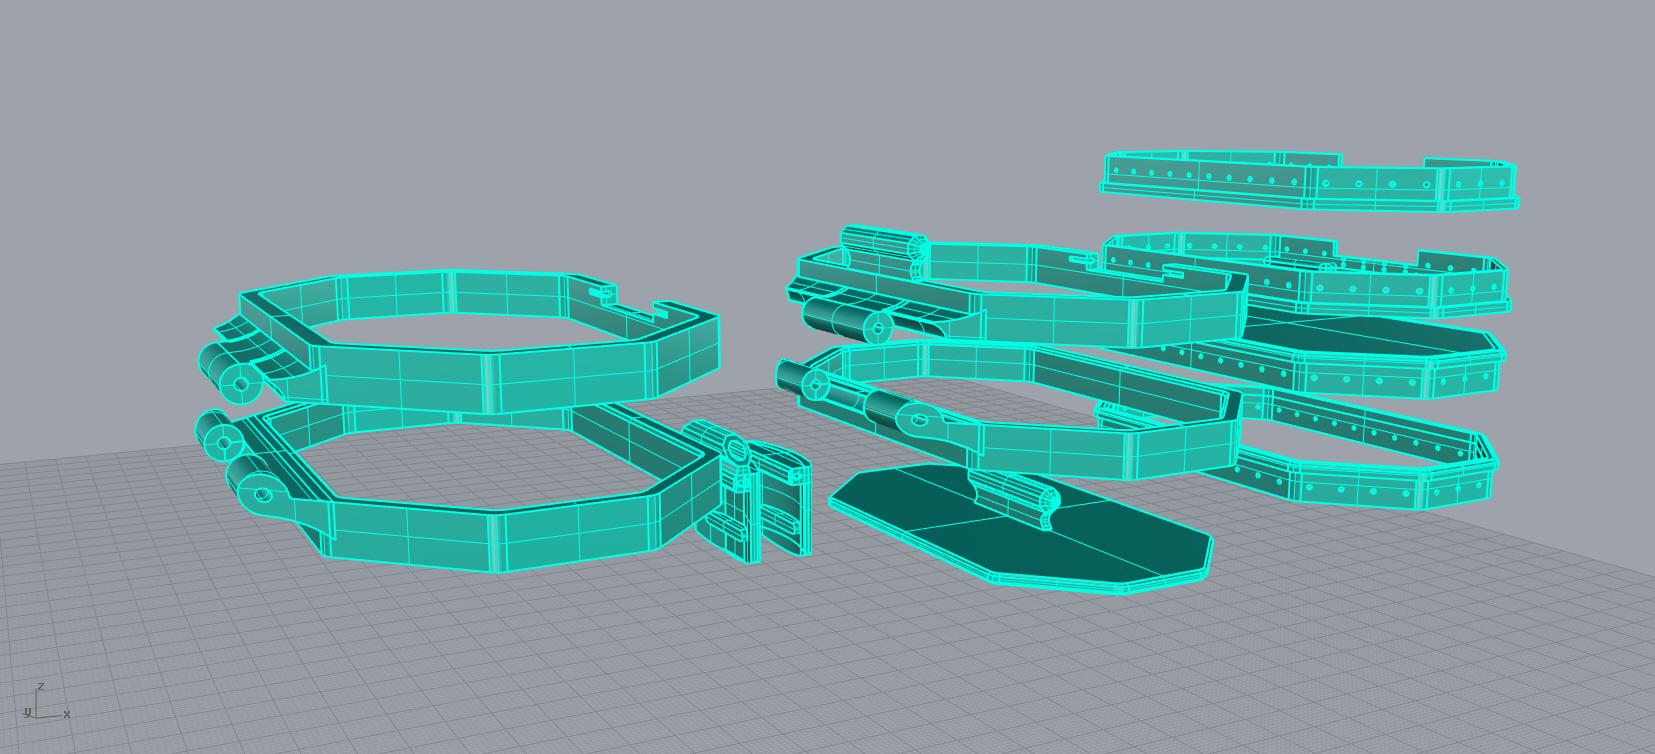 3d_model_capture_rendered_4.jpg